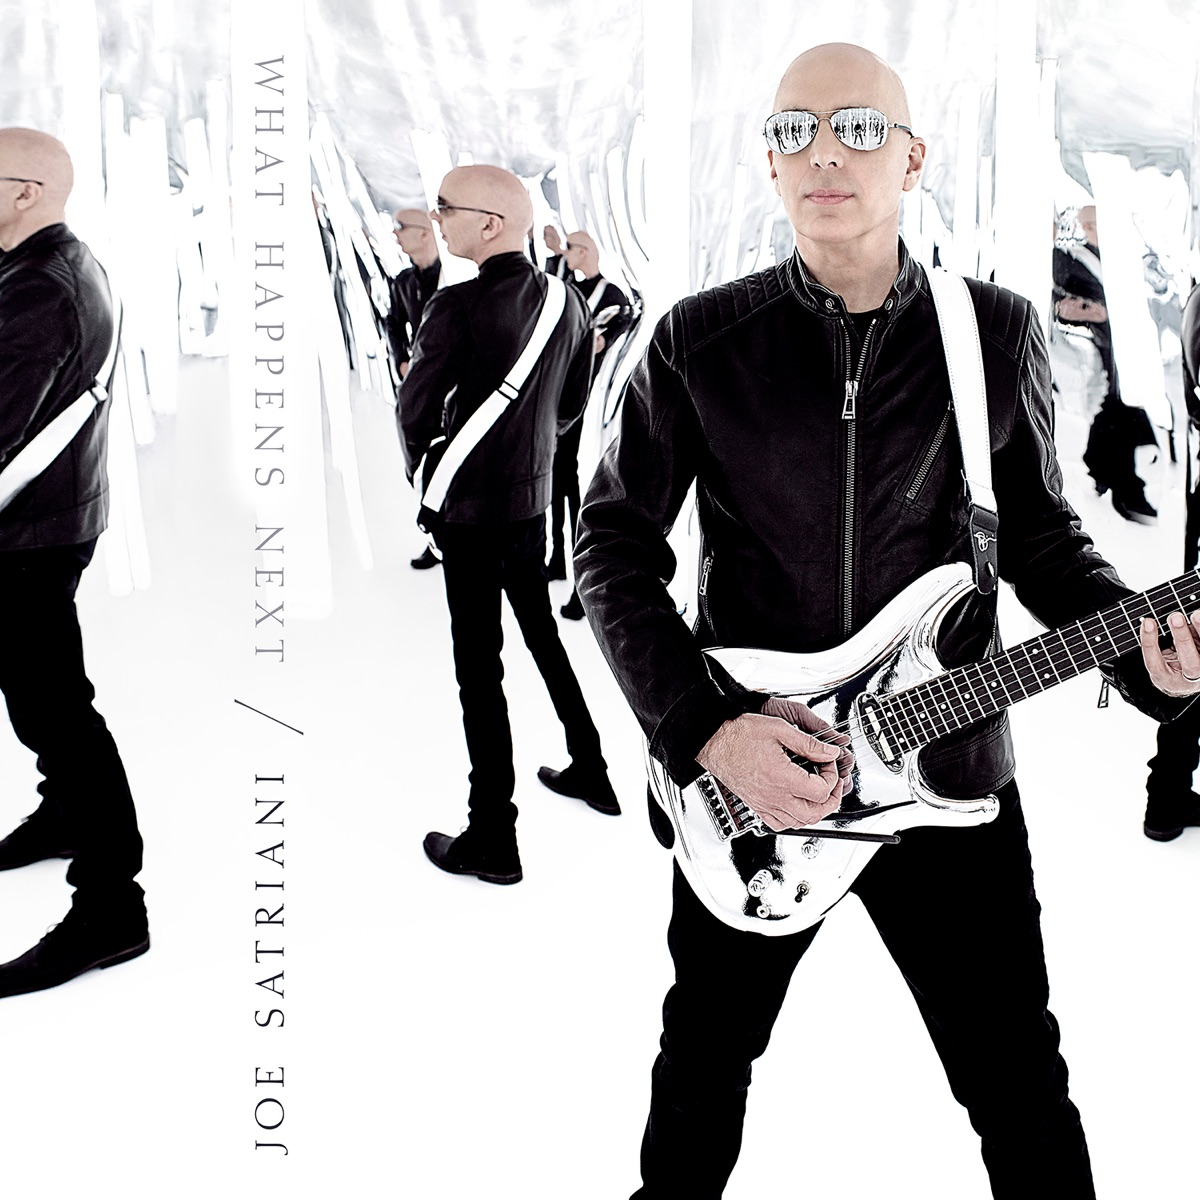 What Happens Next Joe Satriani CD cover